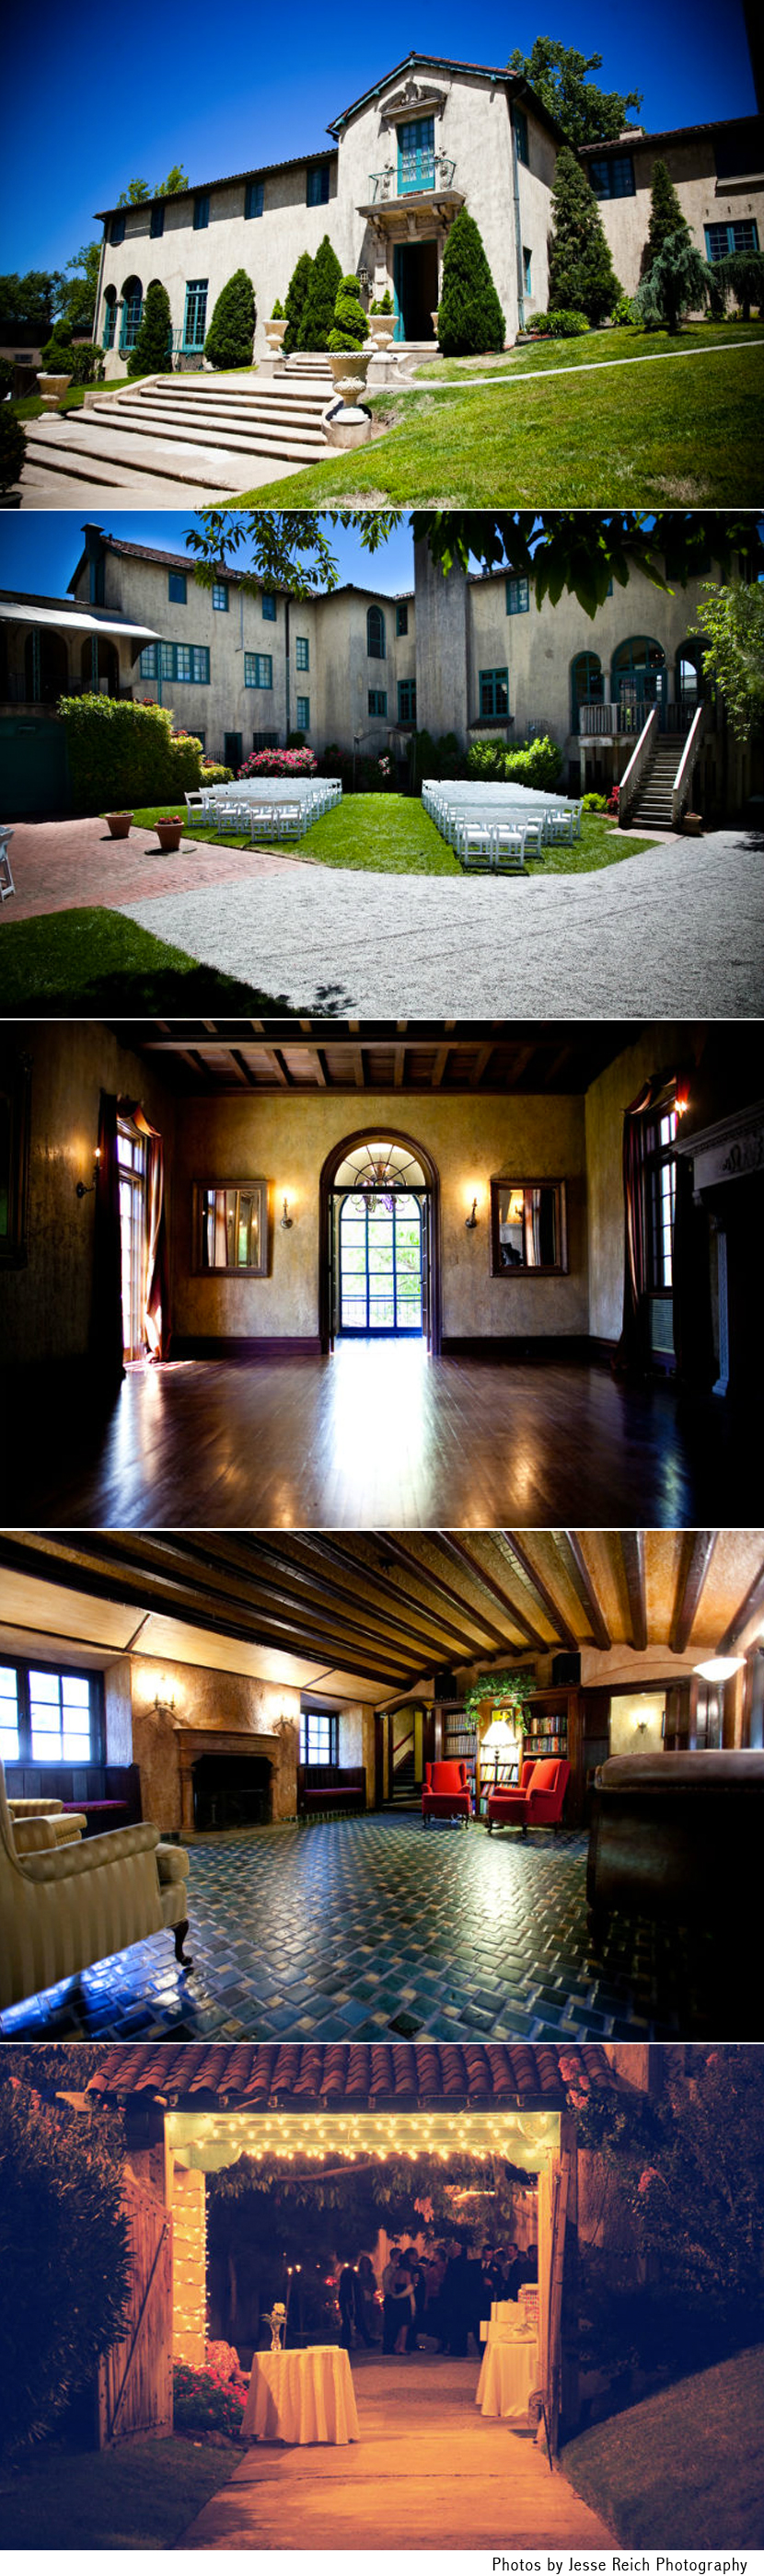 Oklahoma wedding and reception venue Dresser Mansion in Tulsa